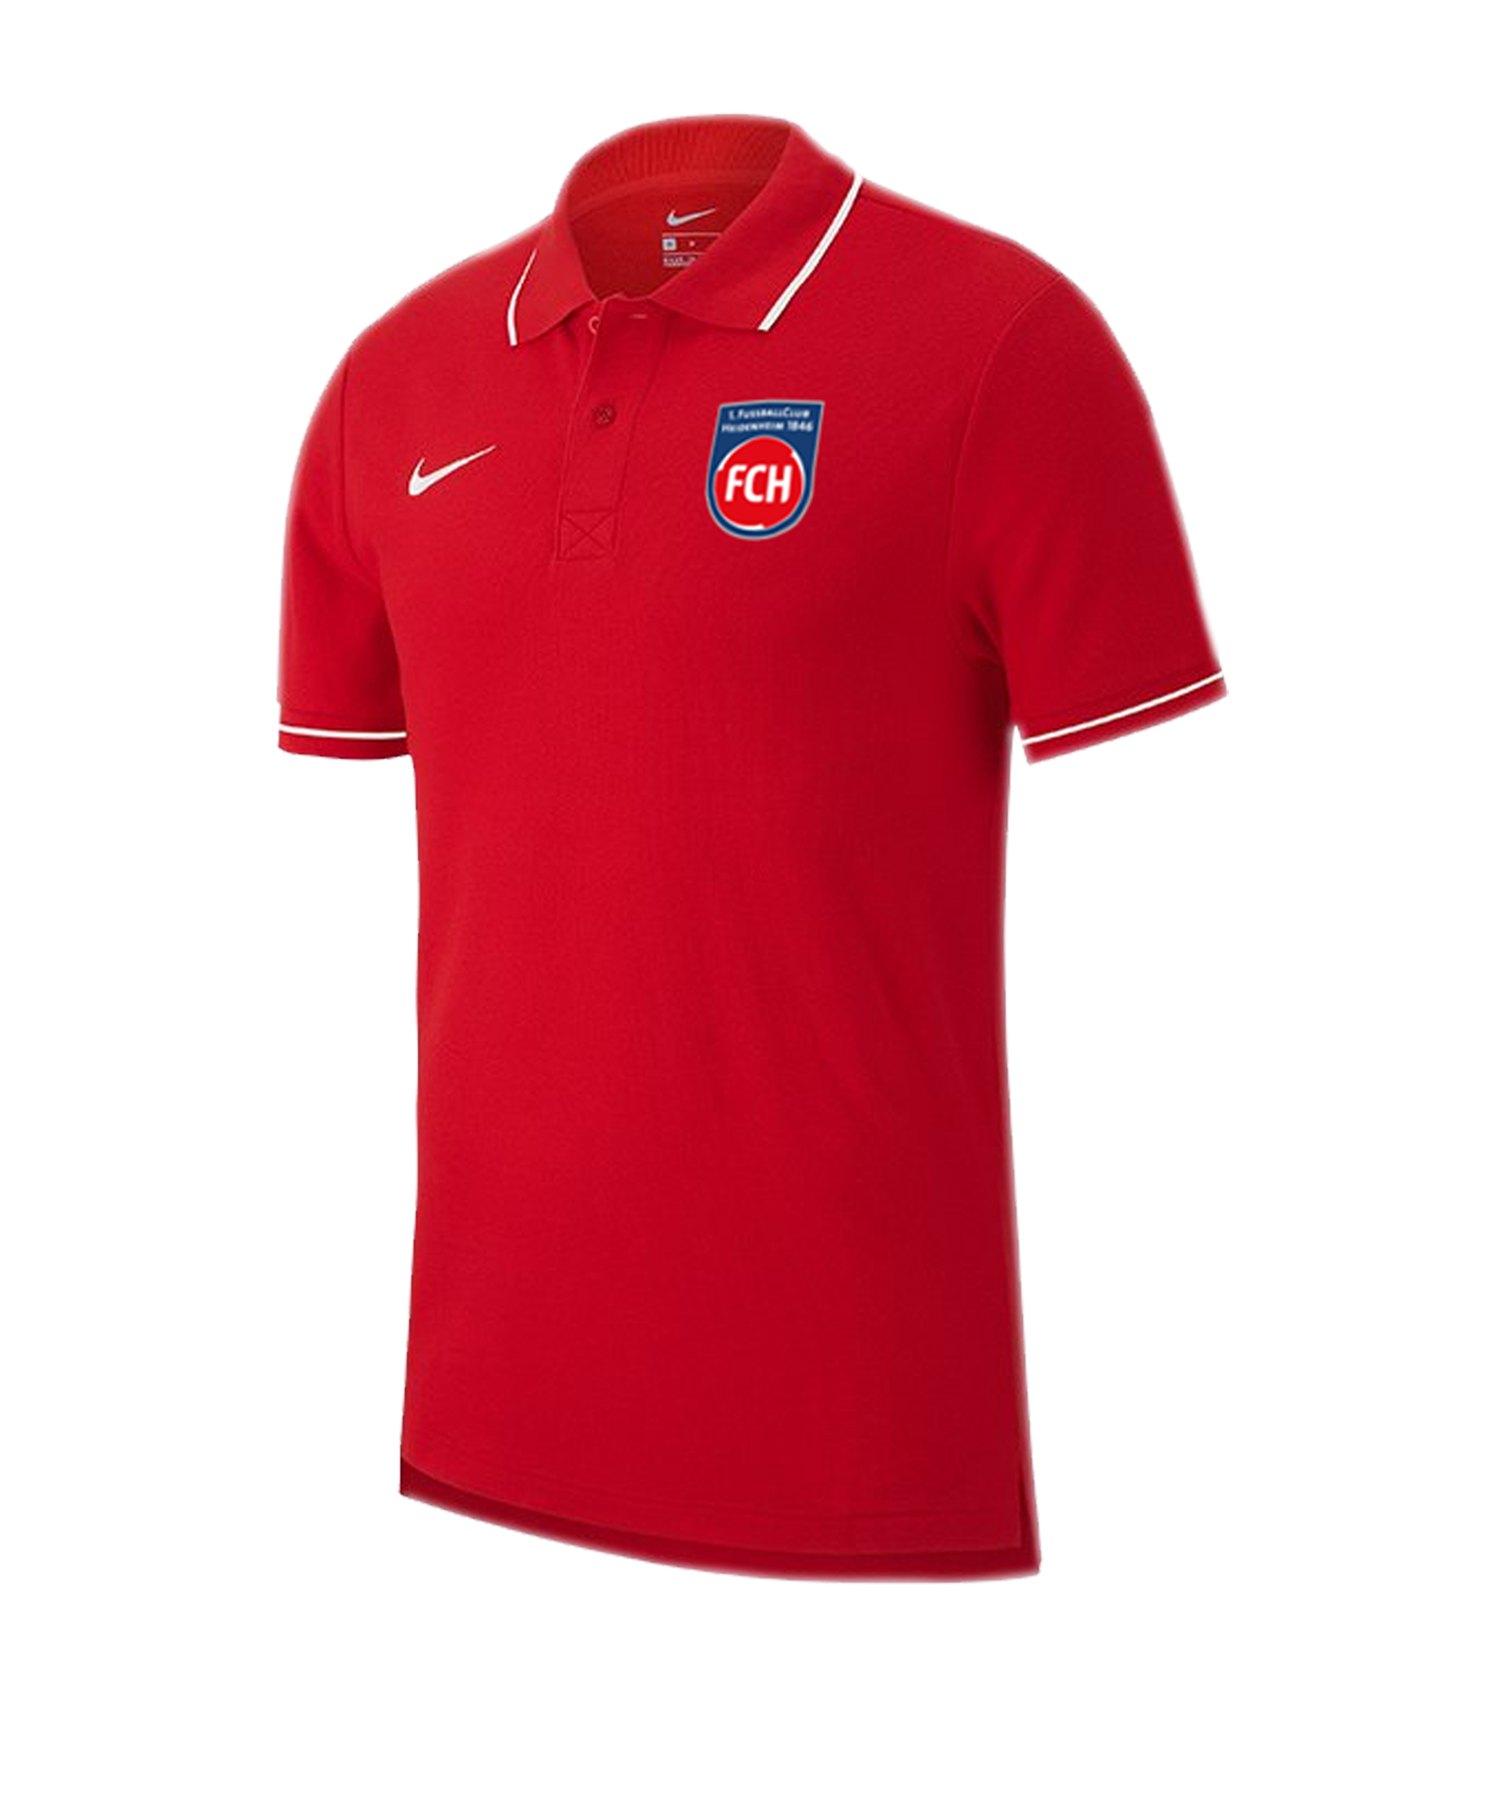 Nike 1. FC Heidenheim Poloshirt 2019/2020 Rot F657 - rot